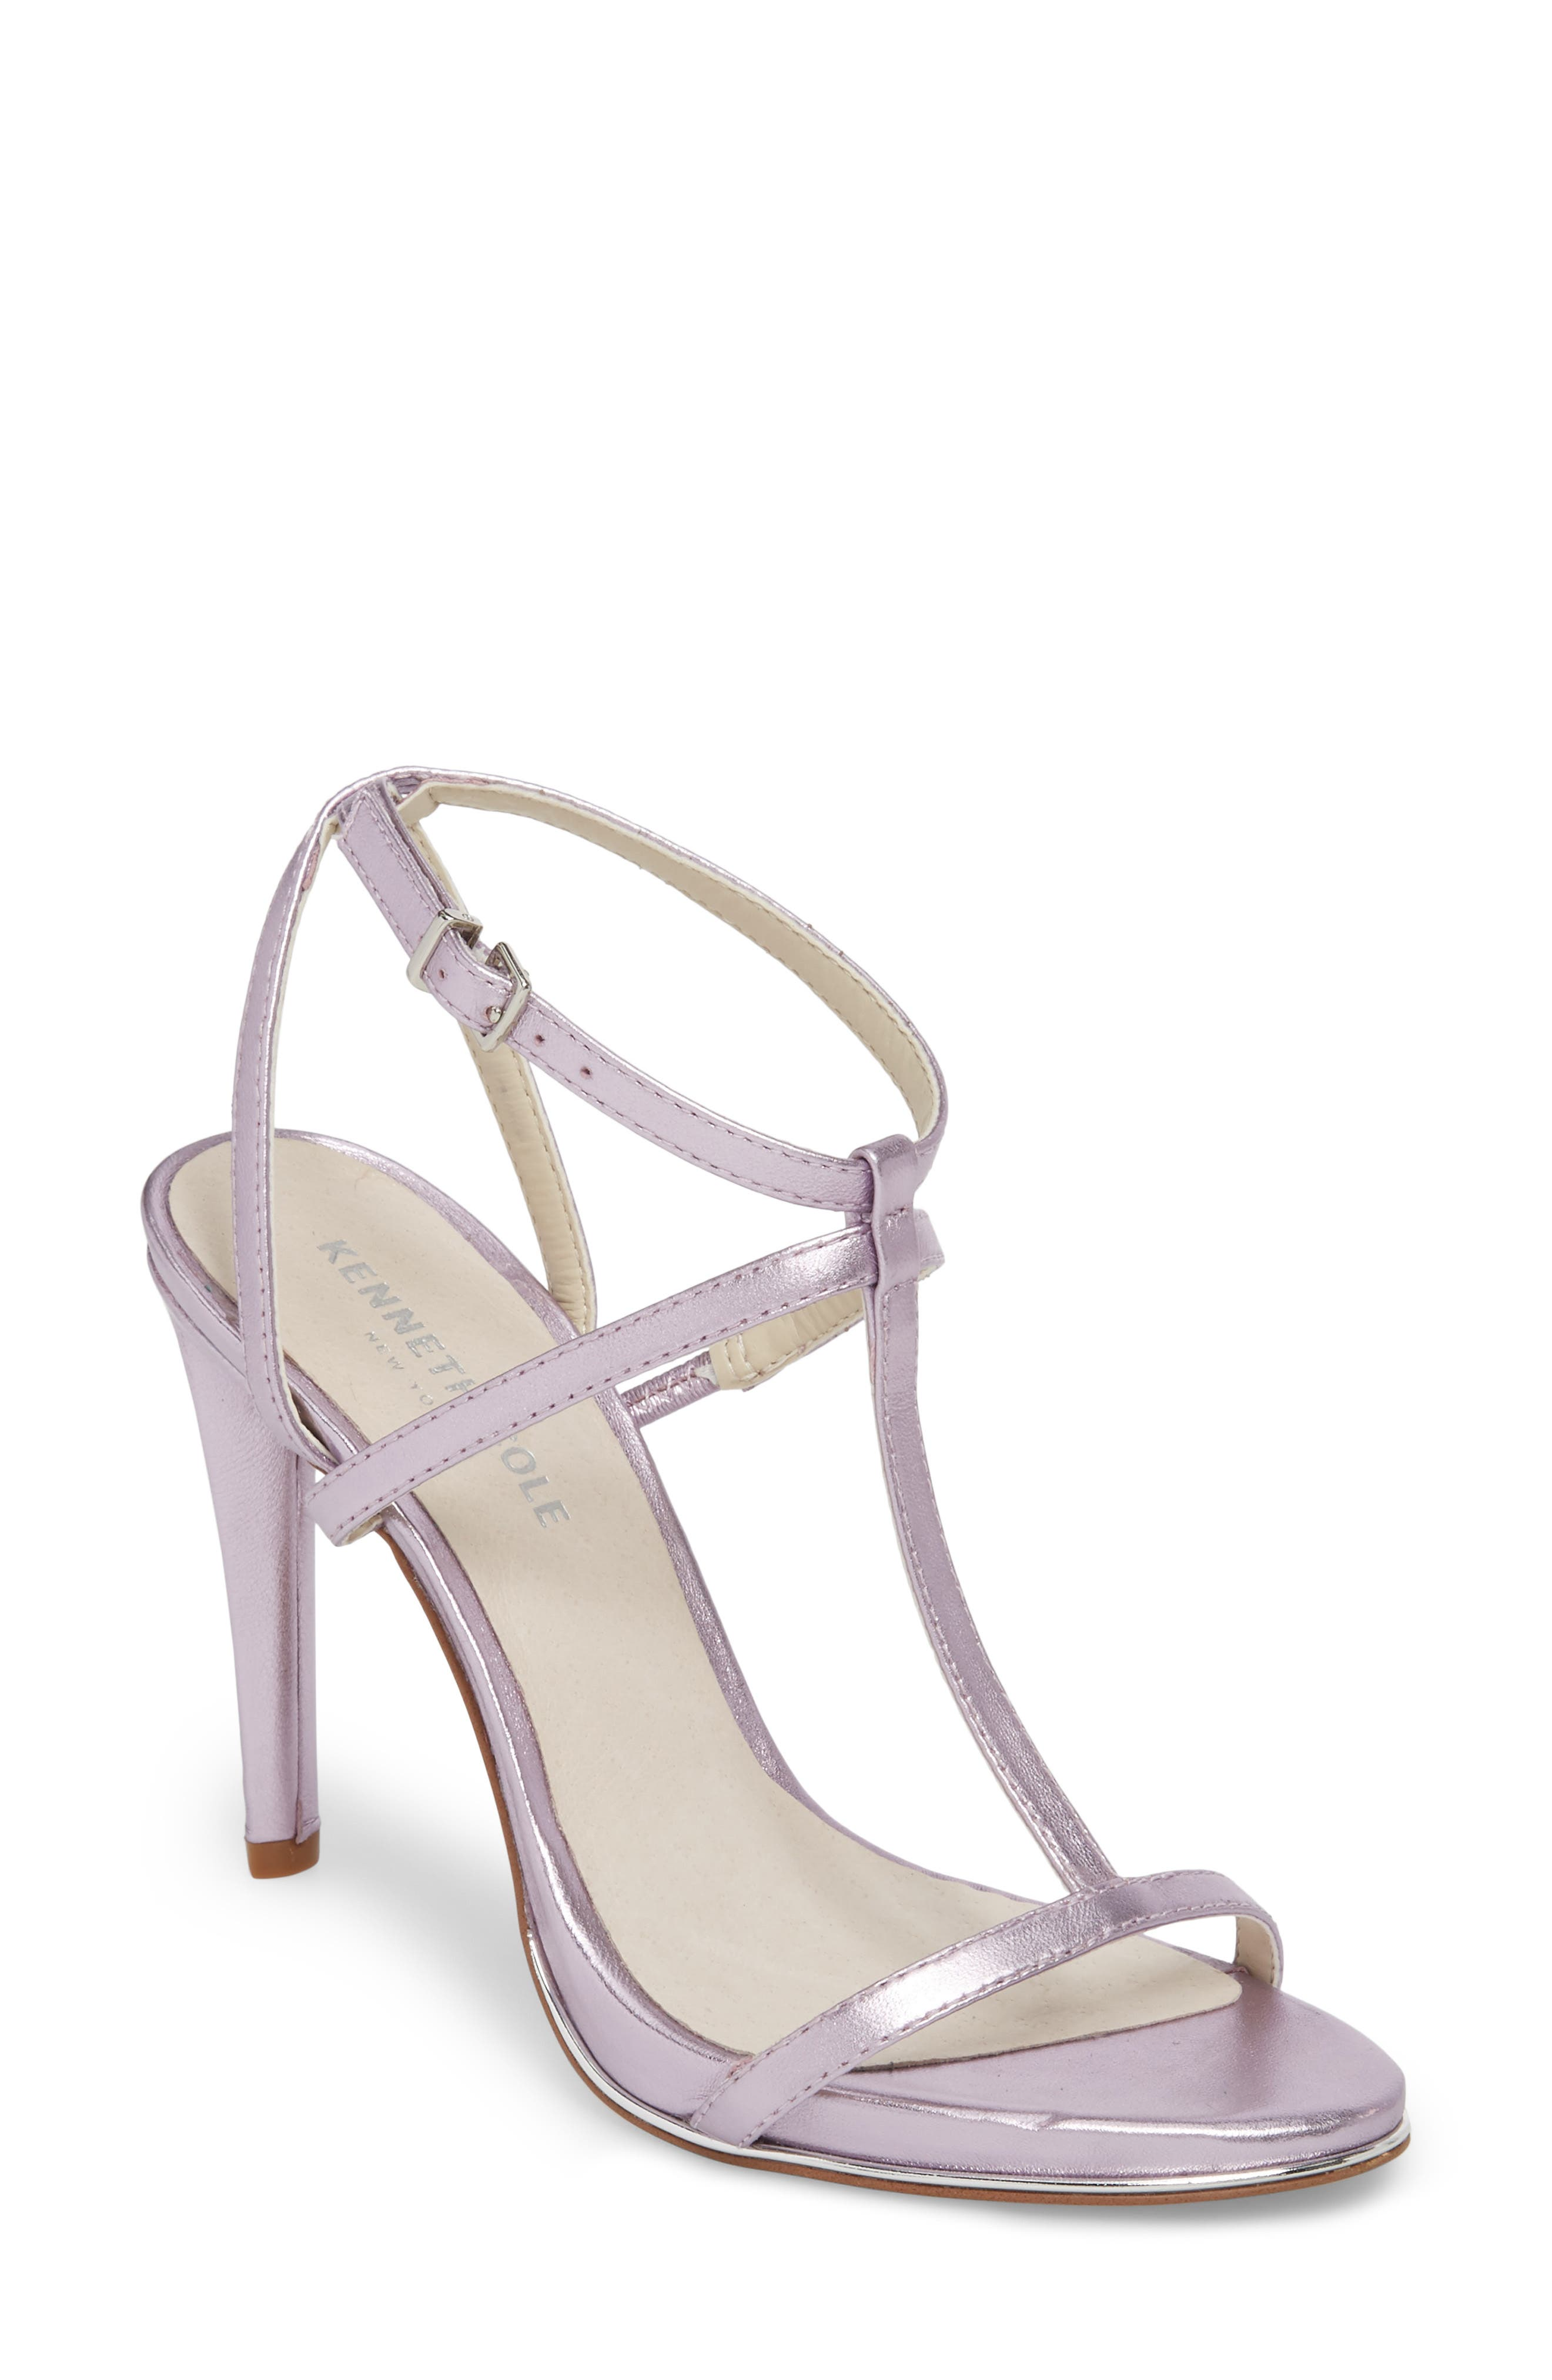 Bellamy Sandal,                         Main,                         color, Lavender Metallic Leather